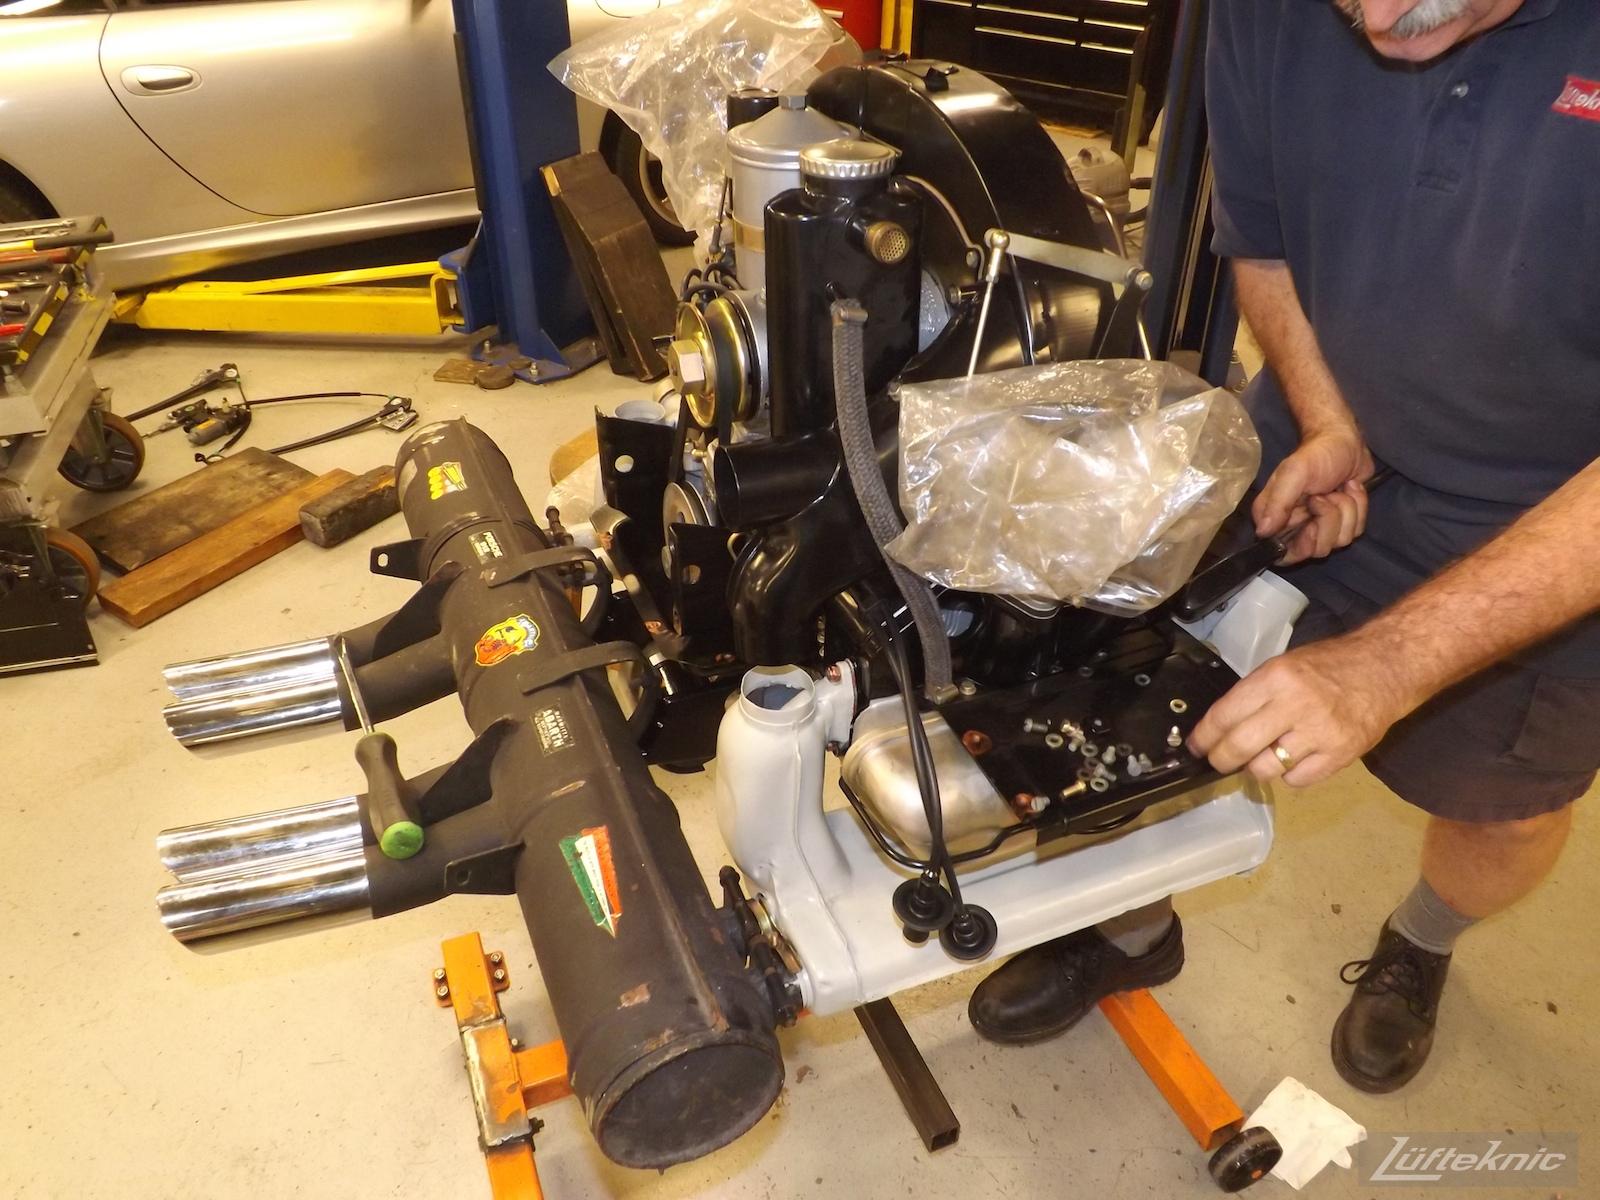 Engine ready for install for an Irish Green Porsche 912 undergoing restoration at Lufteknic.